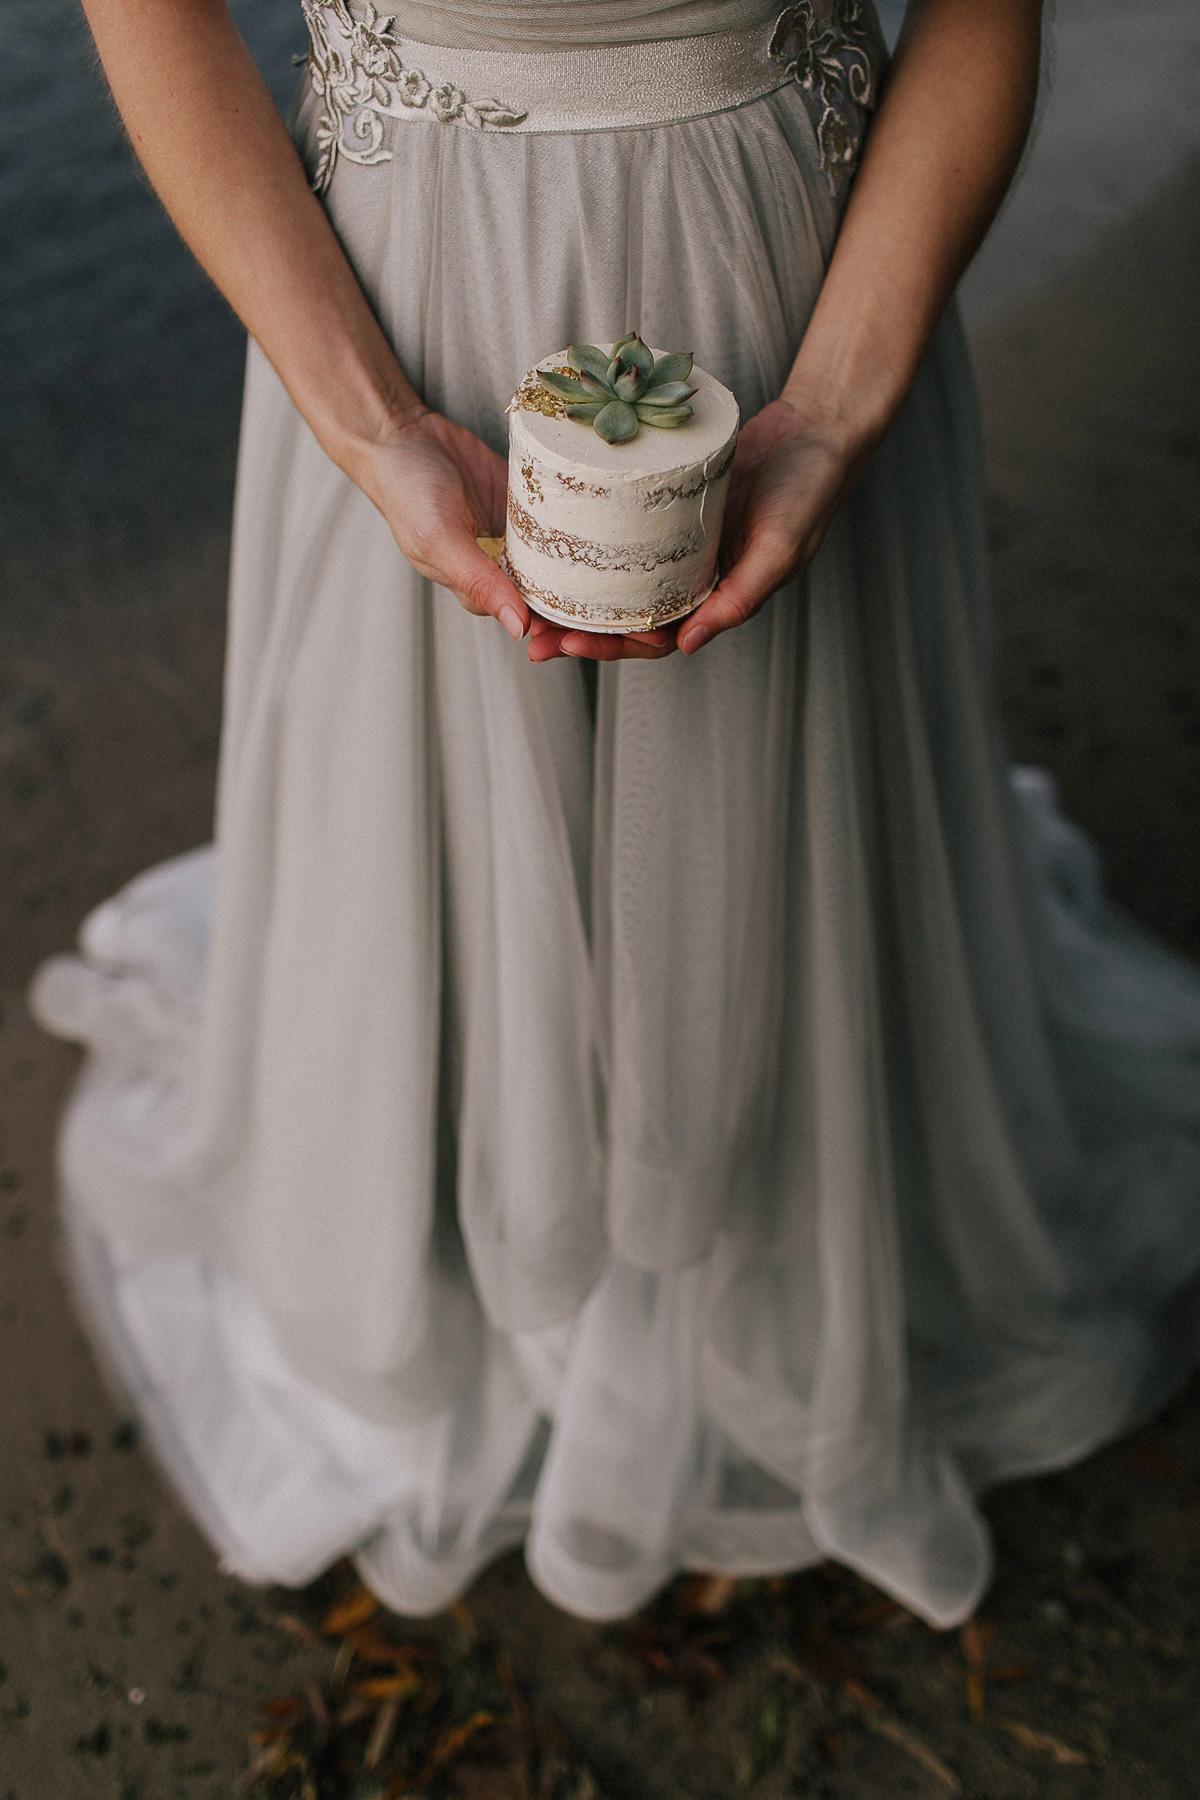 ballad-photography-vineyard-bride-swish-list-niagara-seaside-wedding-editorial-32.jpg